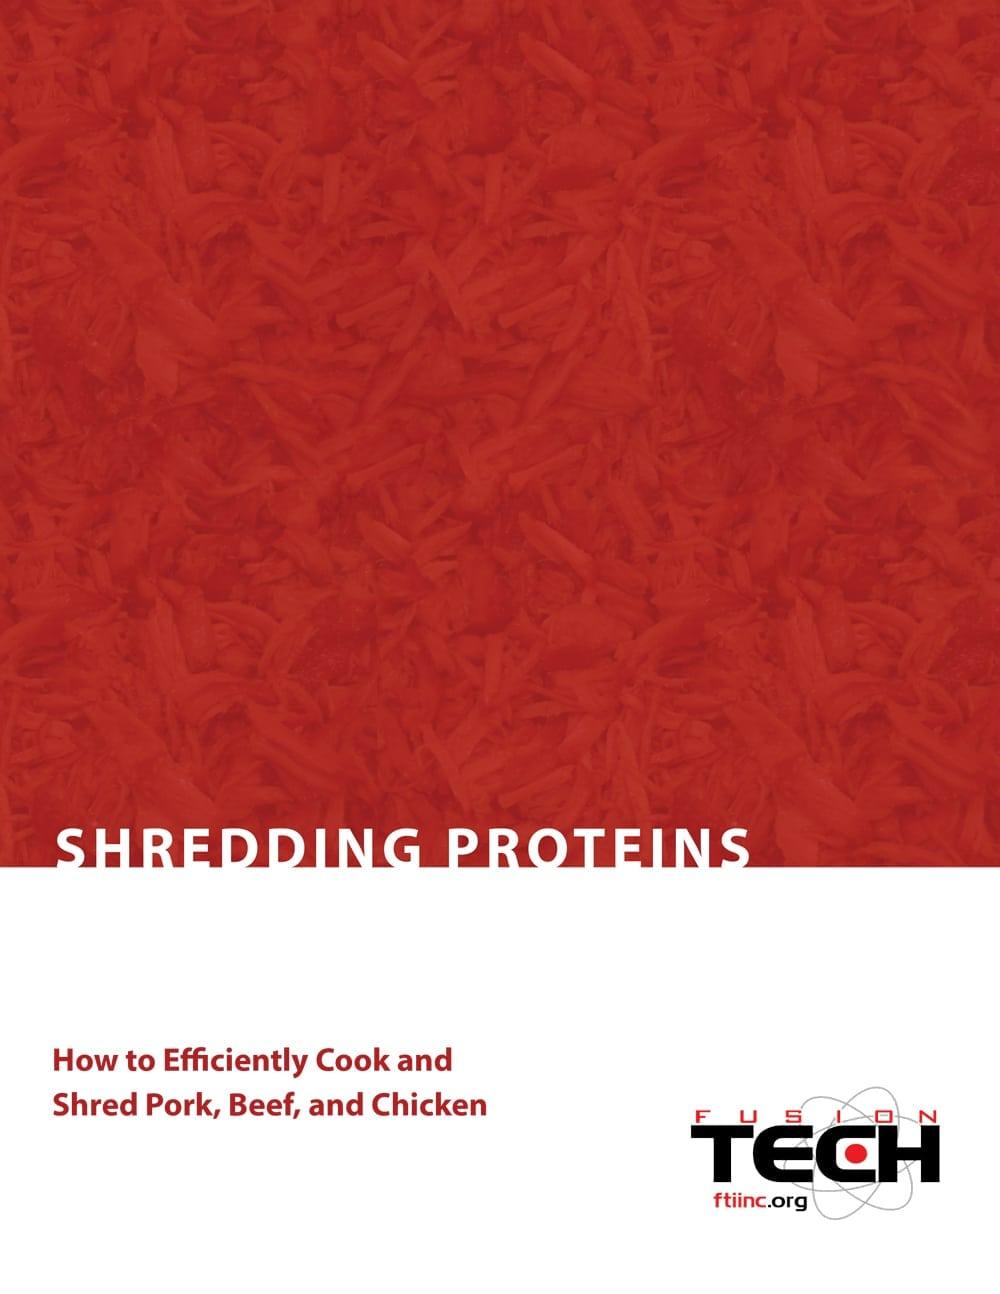 Shredding Proteins